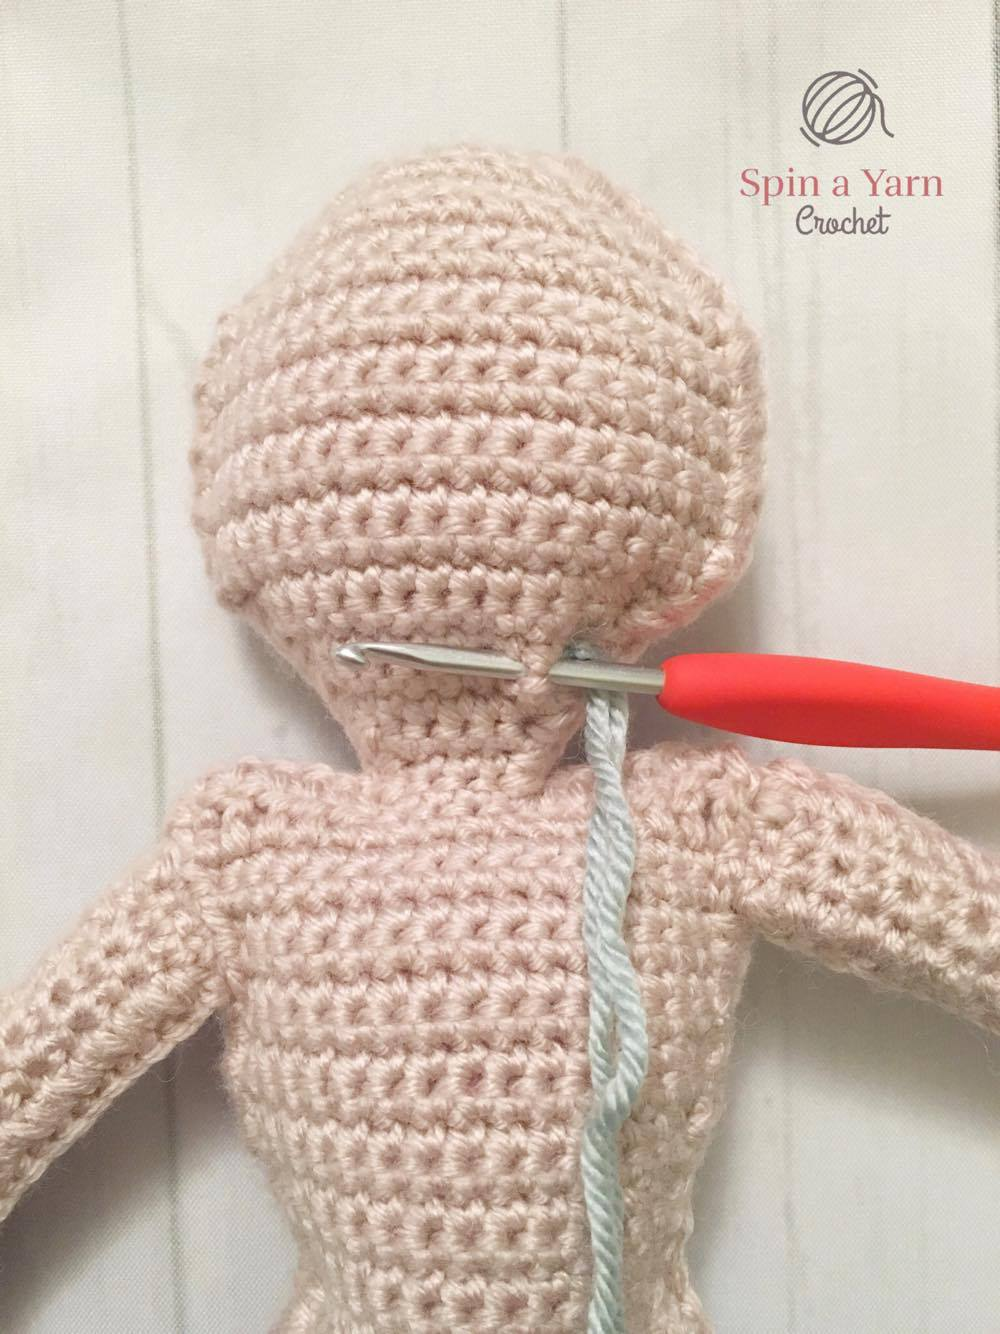 Ragdoll Mermaid Free Crochet Pattern Spin A Yarn Crochet